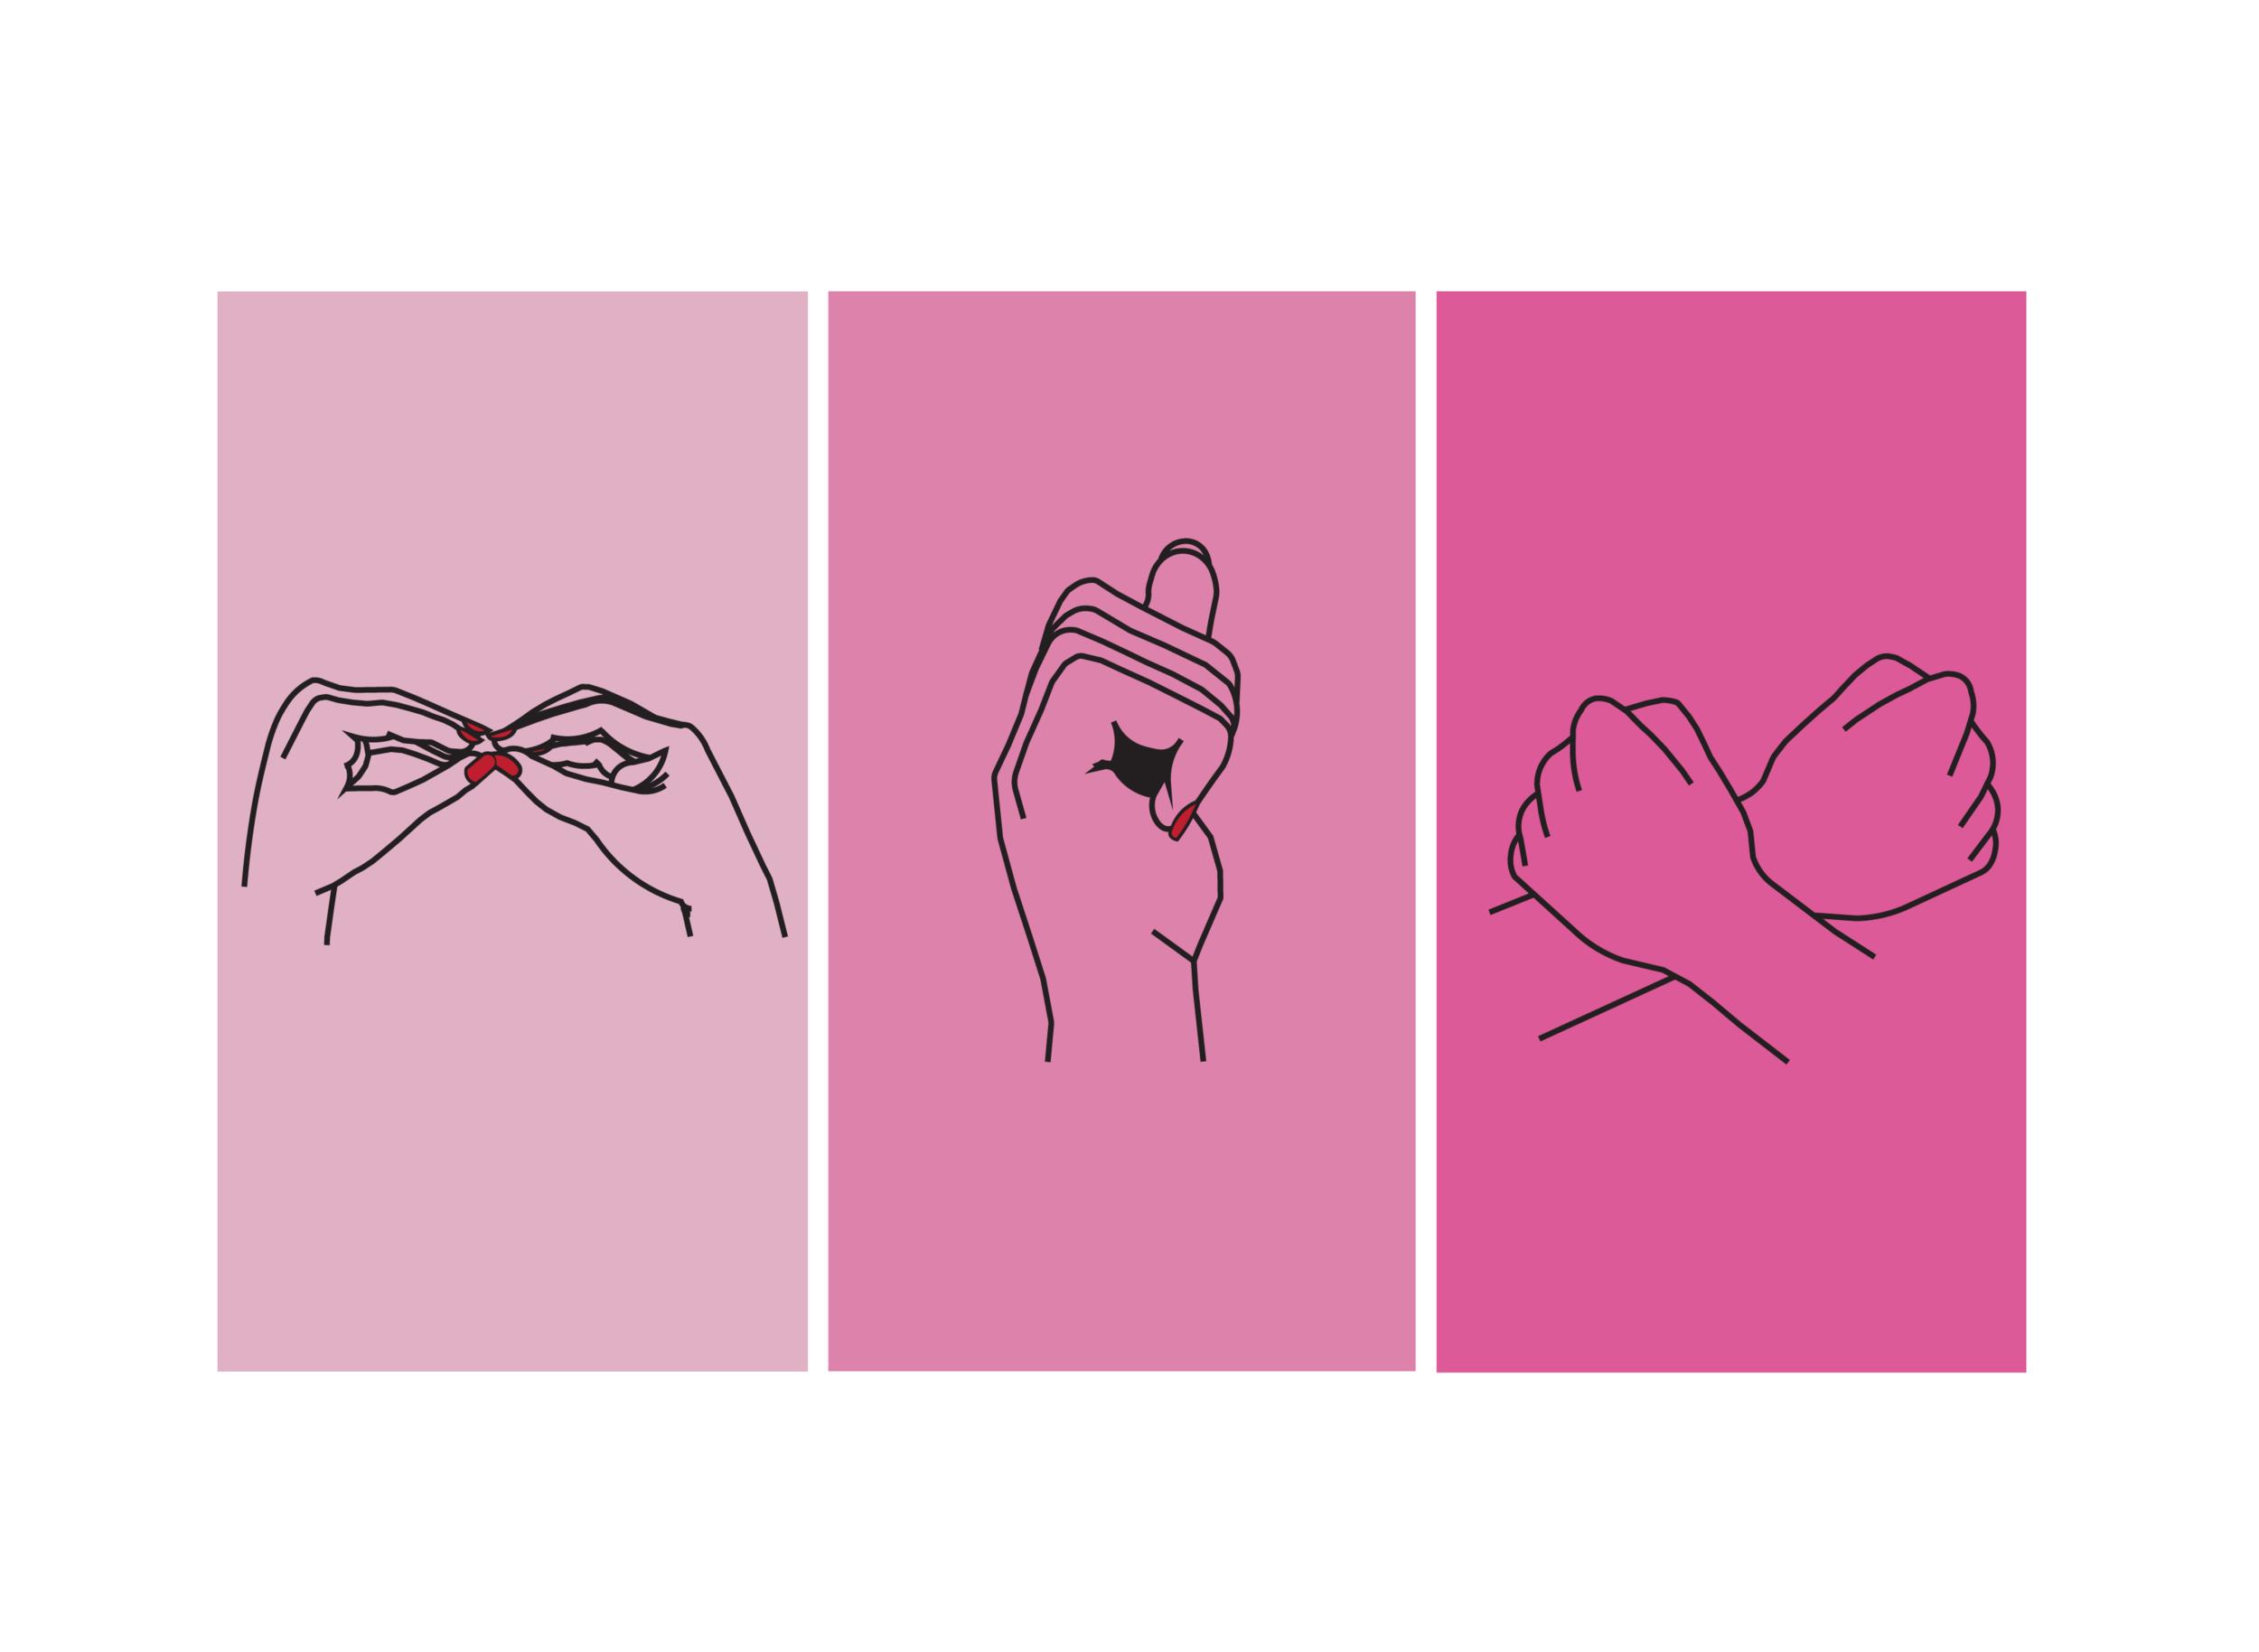 Illustration | Sign language | 2017